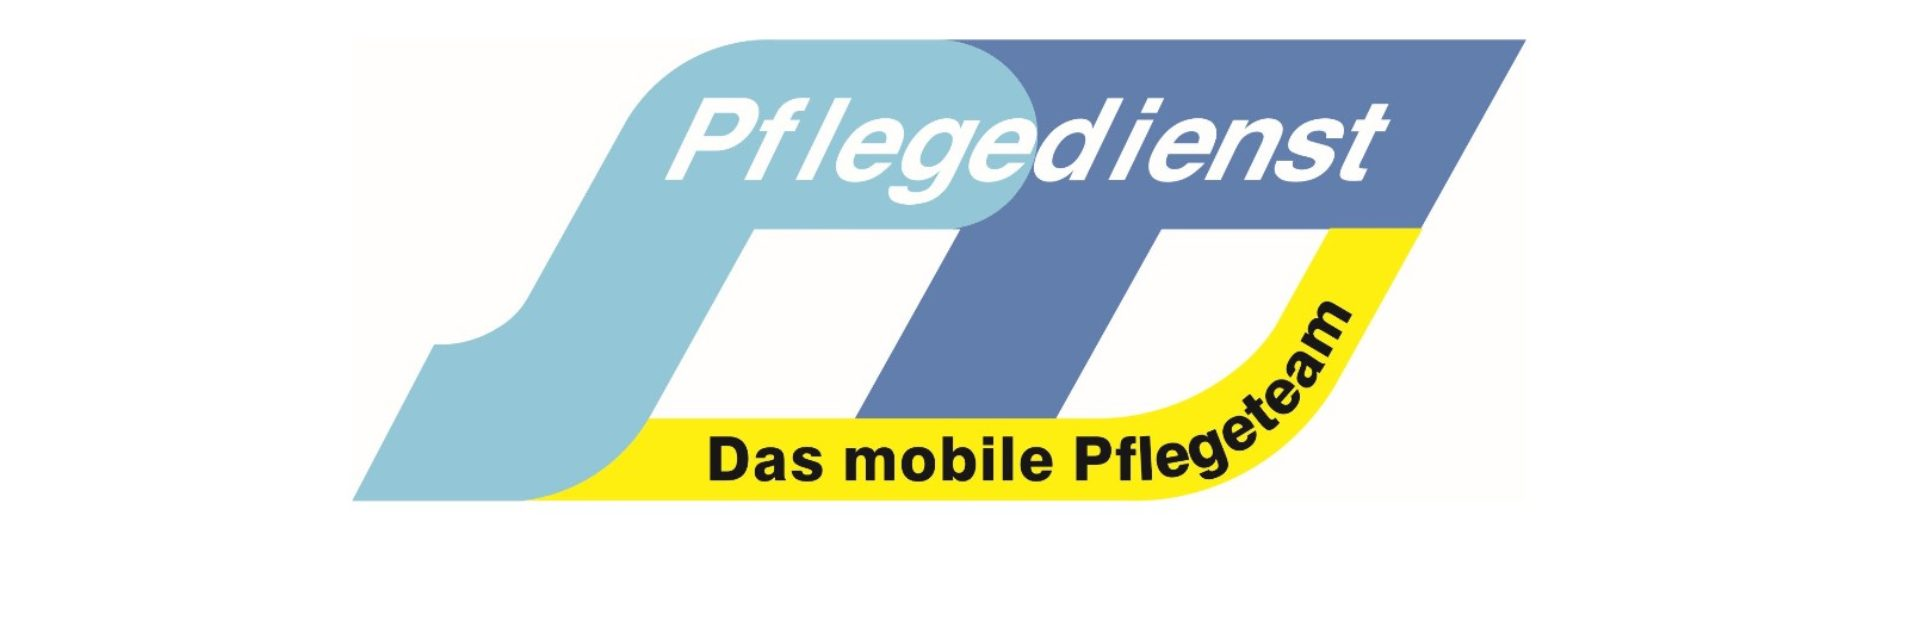 Das mobile Pflegeteam Laubach